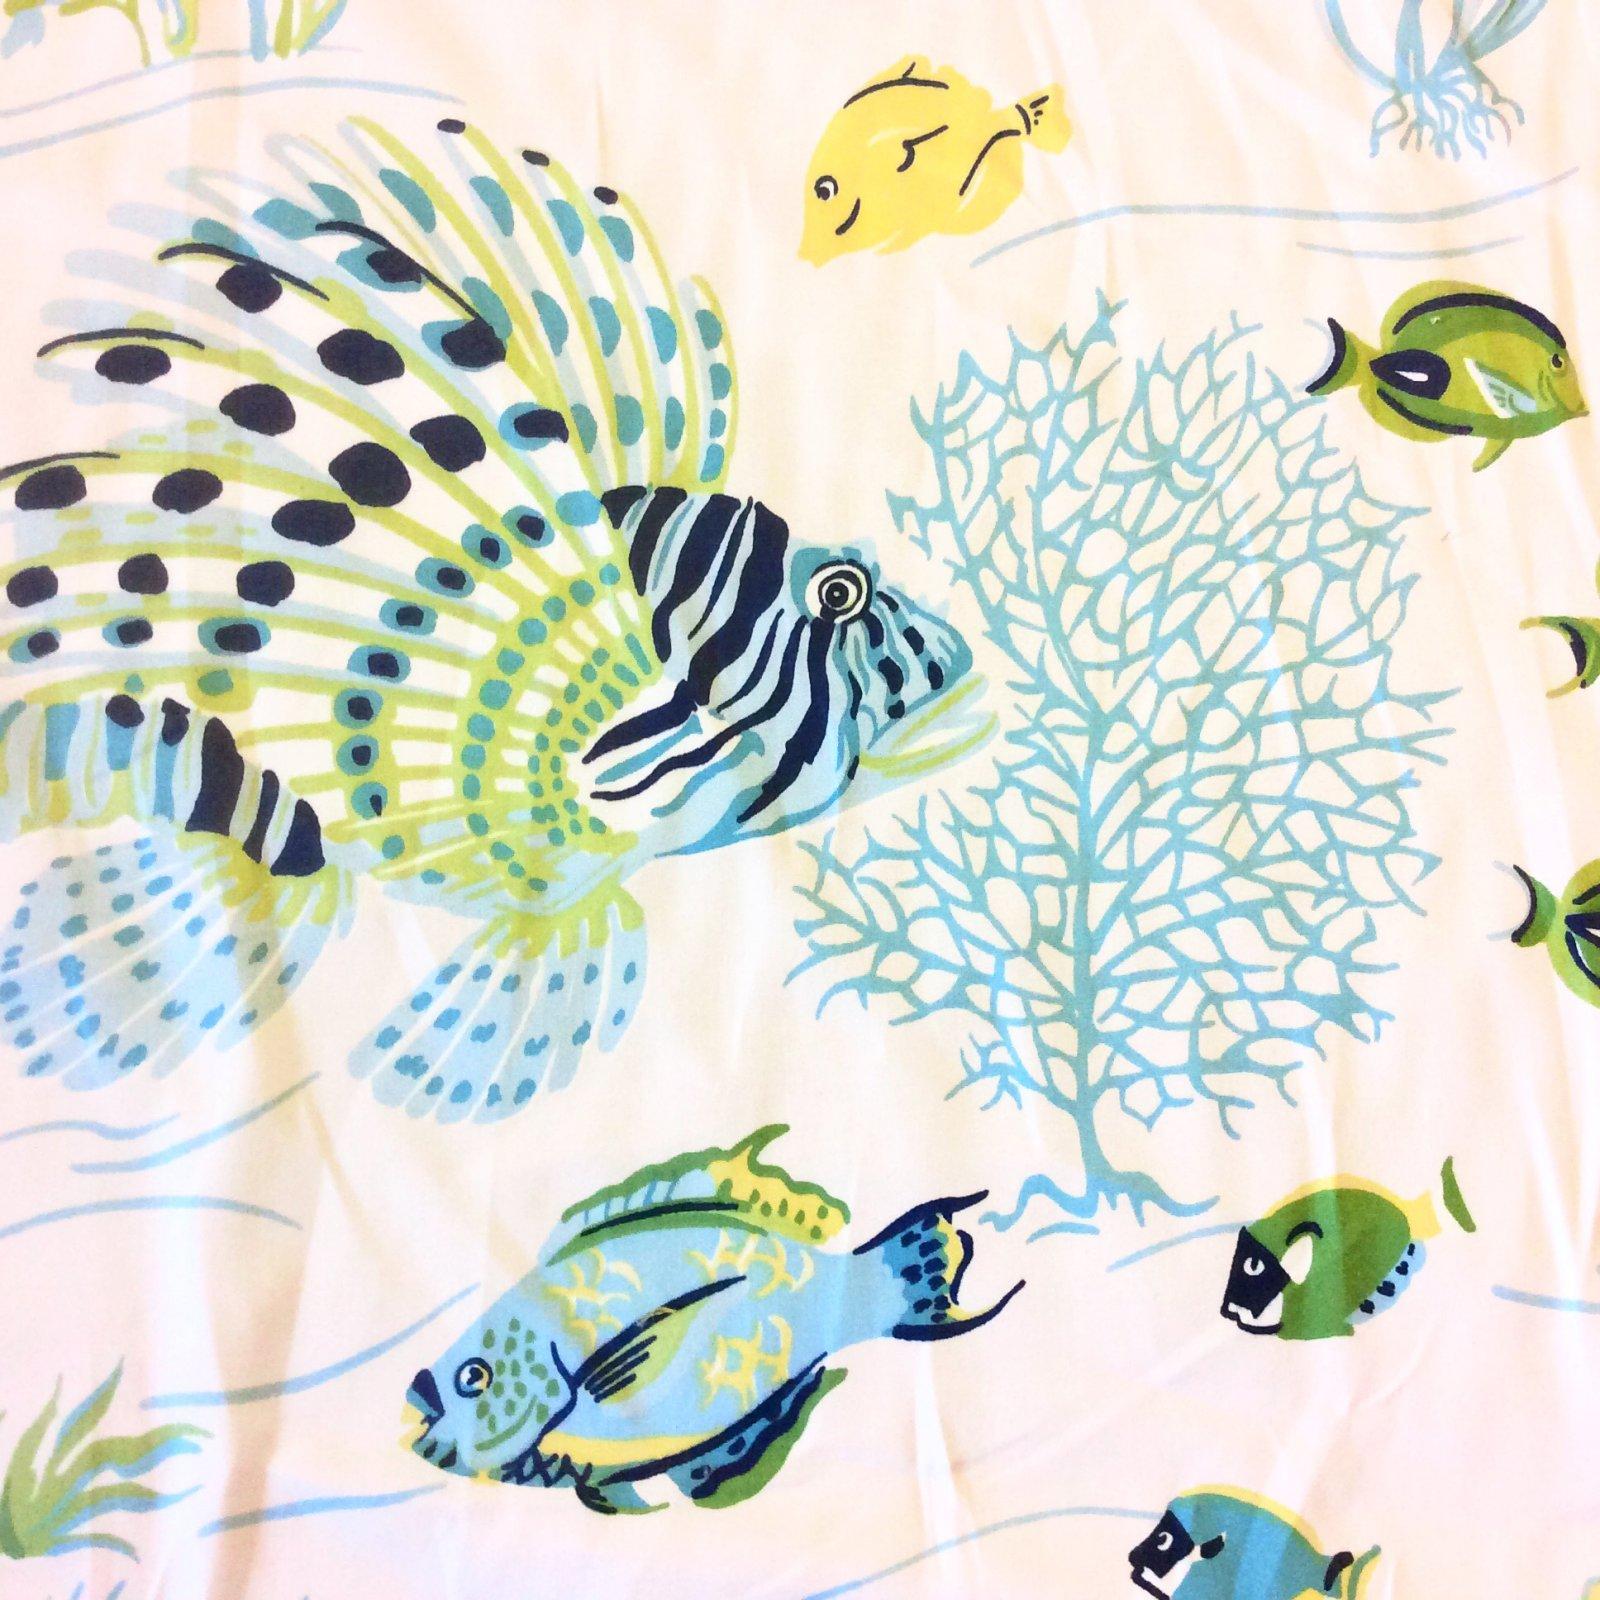 Sea Life Delmar Ocean Shells Lobster Crab Lionfish Shrimp Fish Heavy Weight Cotton Fabric Drapery Fabric DSO315